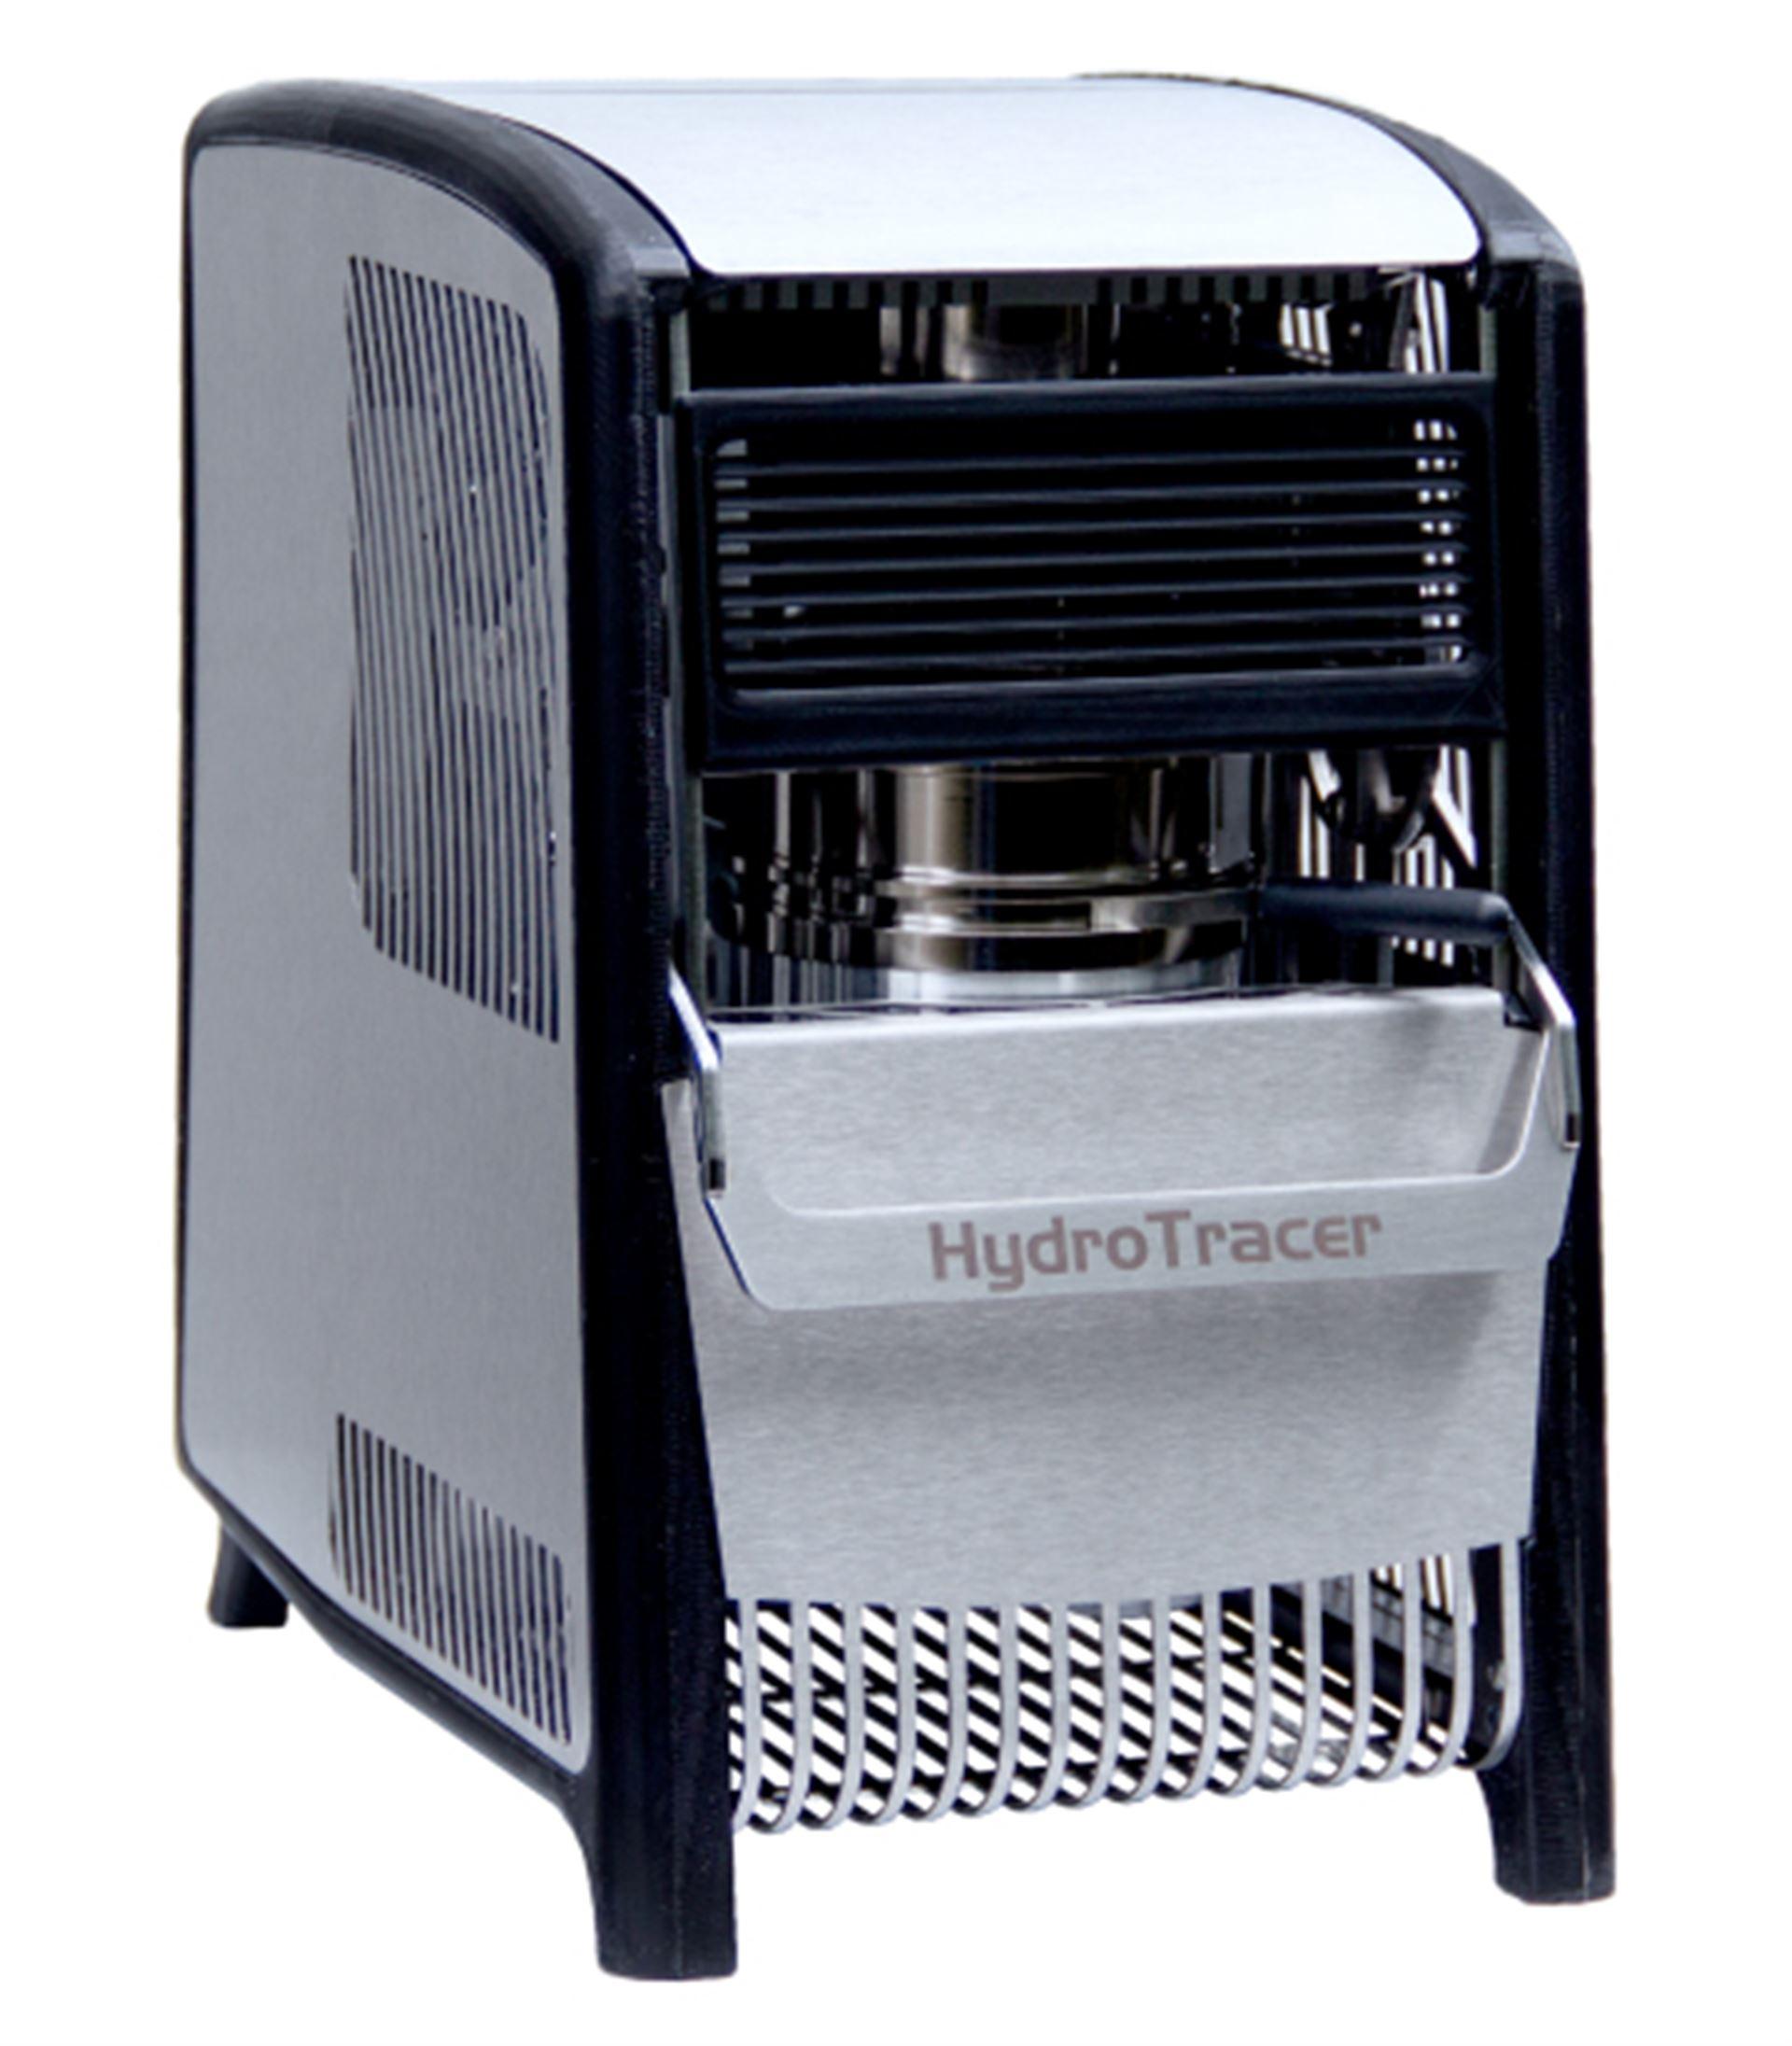 HydroTracer HT3 - Moisture Analyzer